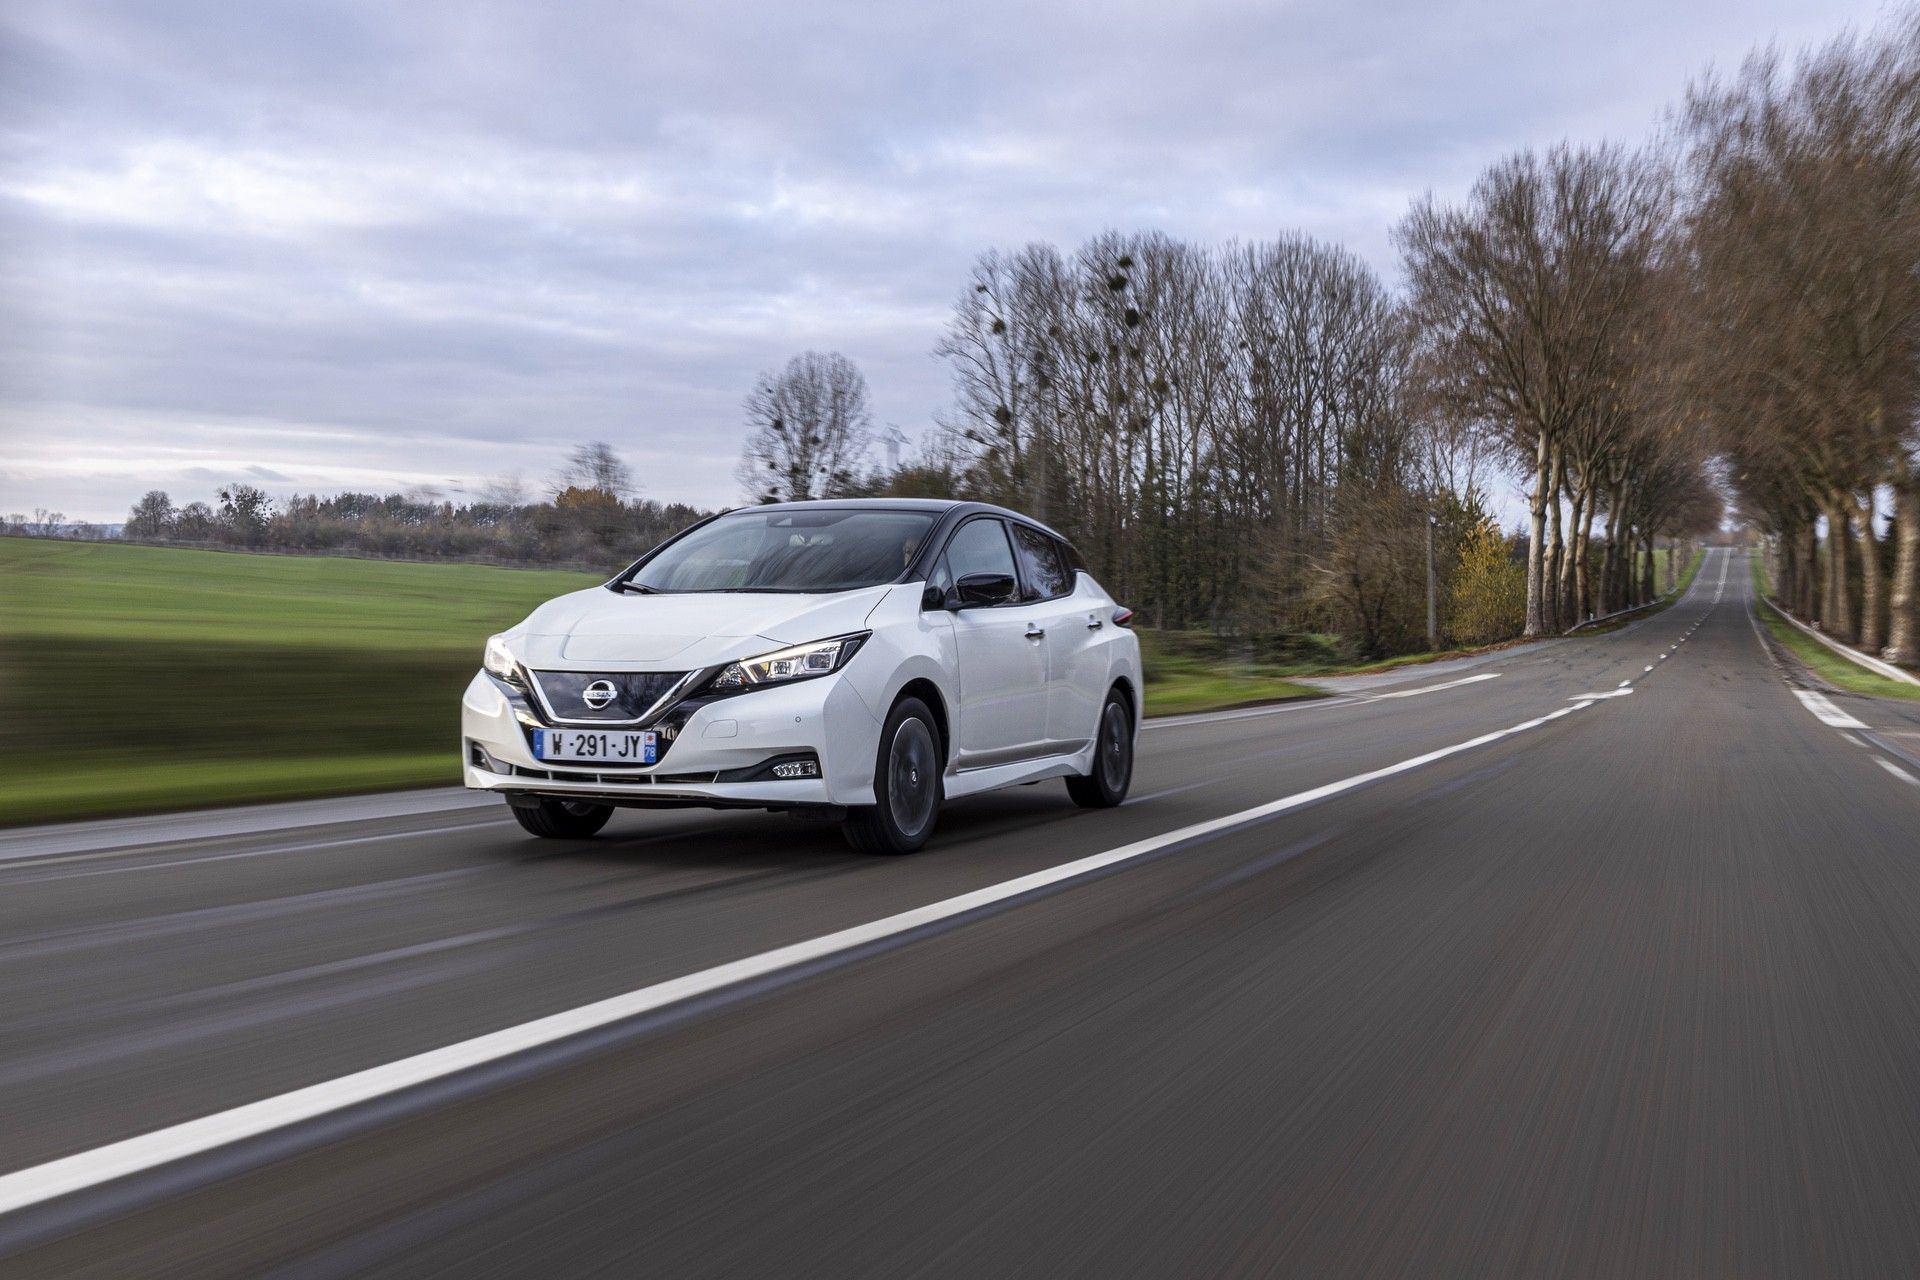 Nissan_Leaf10_special_edition-0014